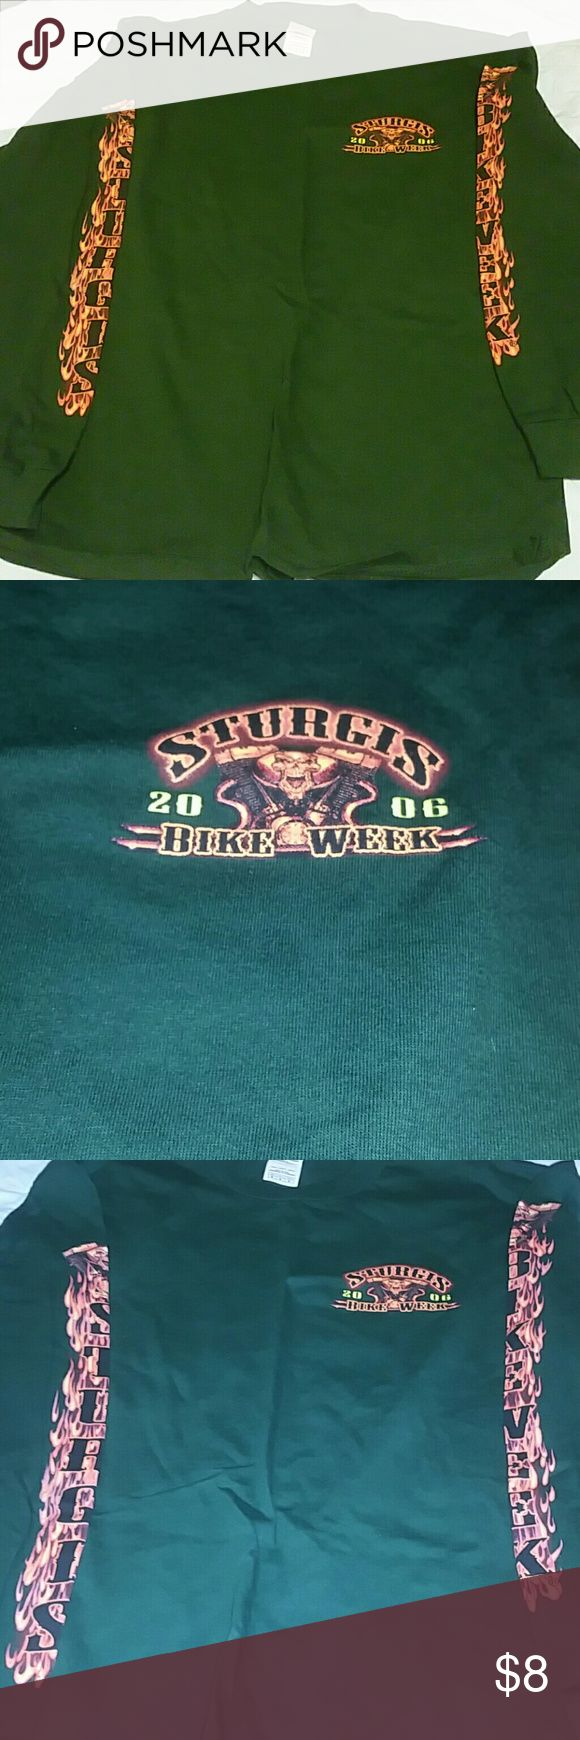 Men's Sturgis Long Sleeved T-shirt Men's medium 2006 Sturgis Bike Week long sleeved tshirt with logo & flame detail down both sleeves. Euc. Dark army green. Delta Shirts Tees - Long Sleeve